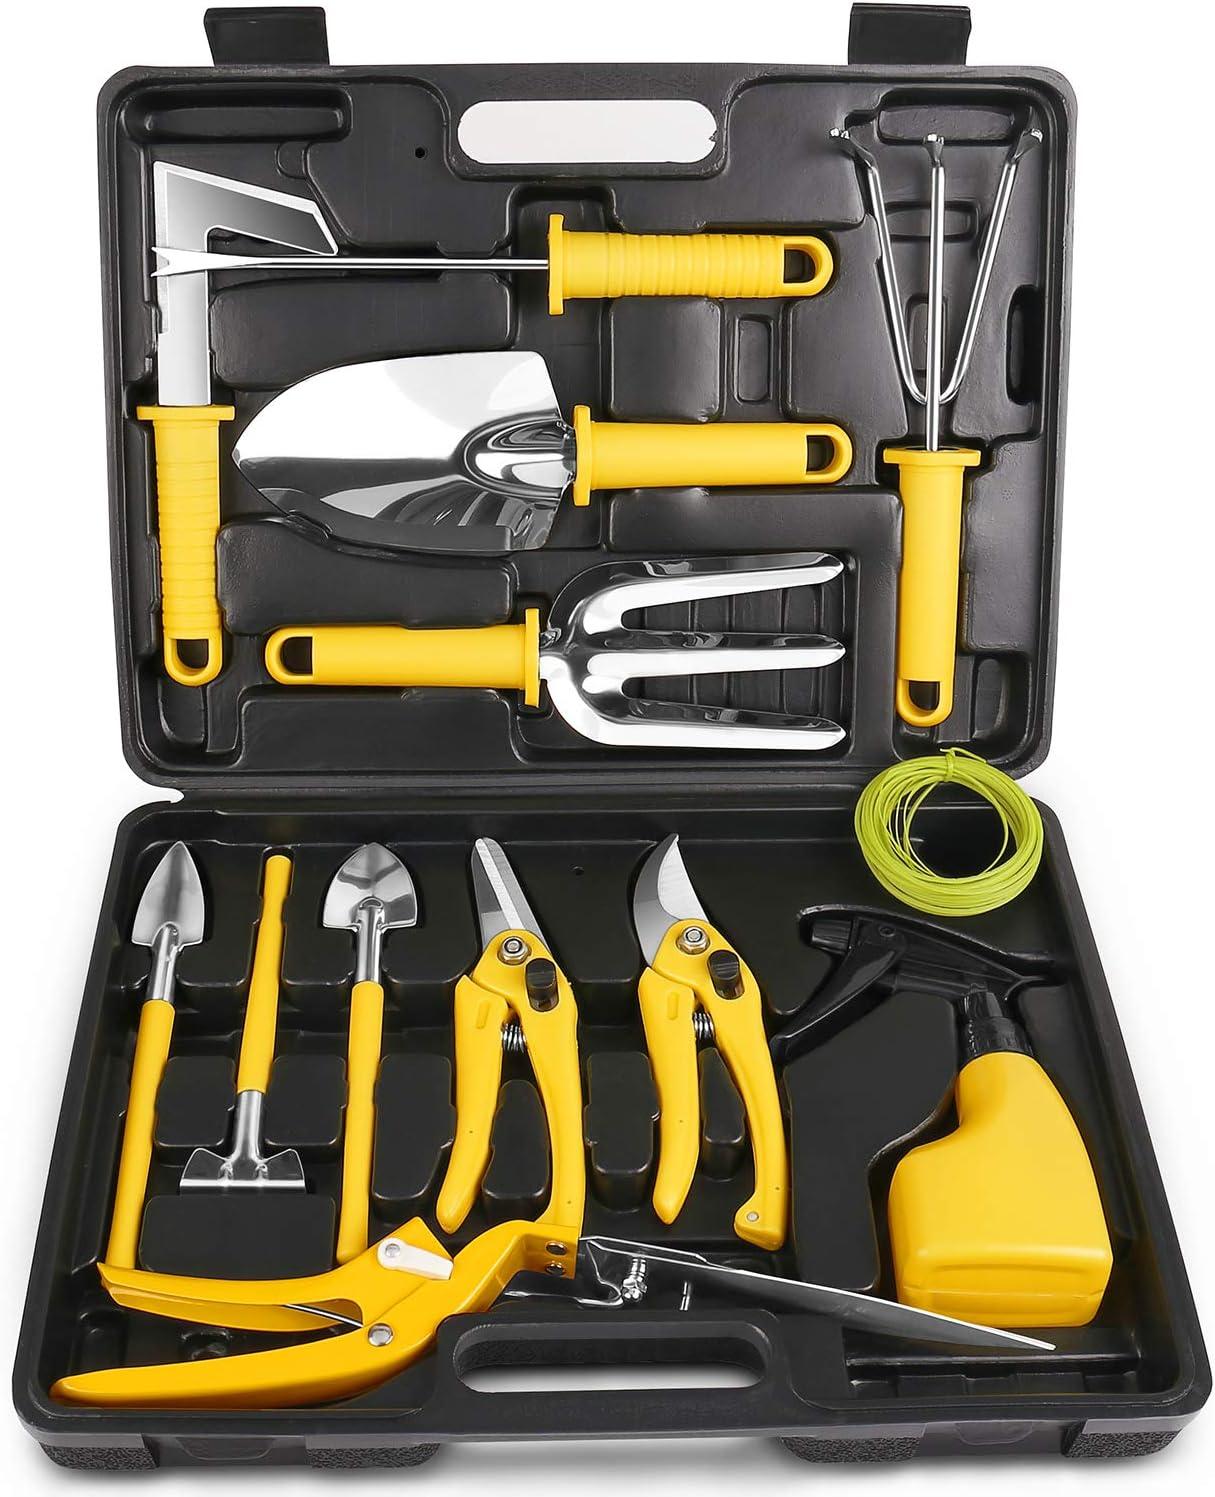 MOSFiATA Garden Tools Set 14 Pcs Stainless Steel Garden Tool Kit with Carrying Case, Heavy Duty Gardening Work Set, Include Pruner, Mini Rake, Big and Small Shovel, Sprayer, Weeder, Scissor etc.